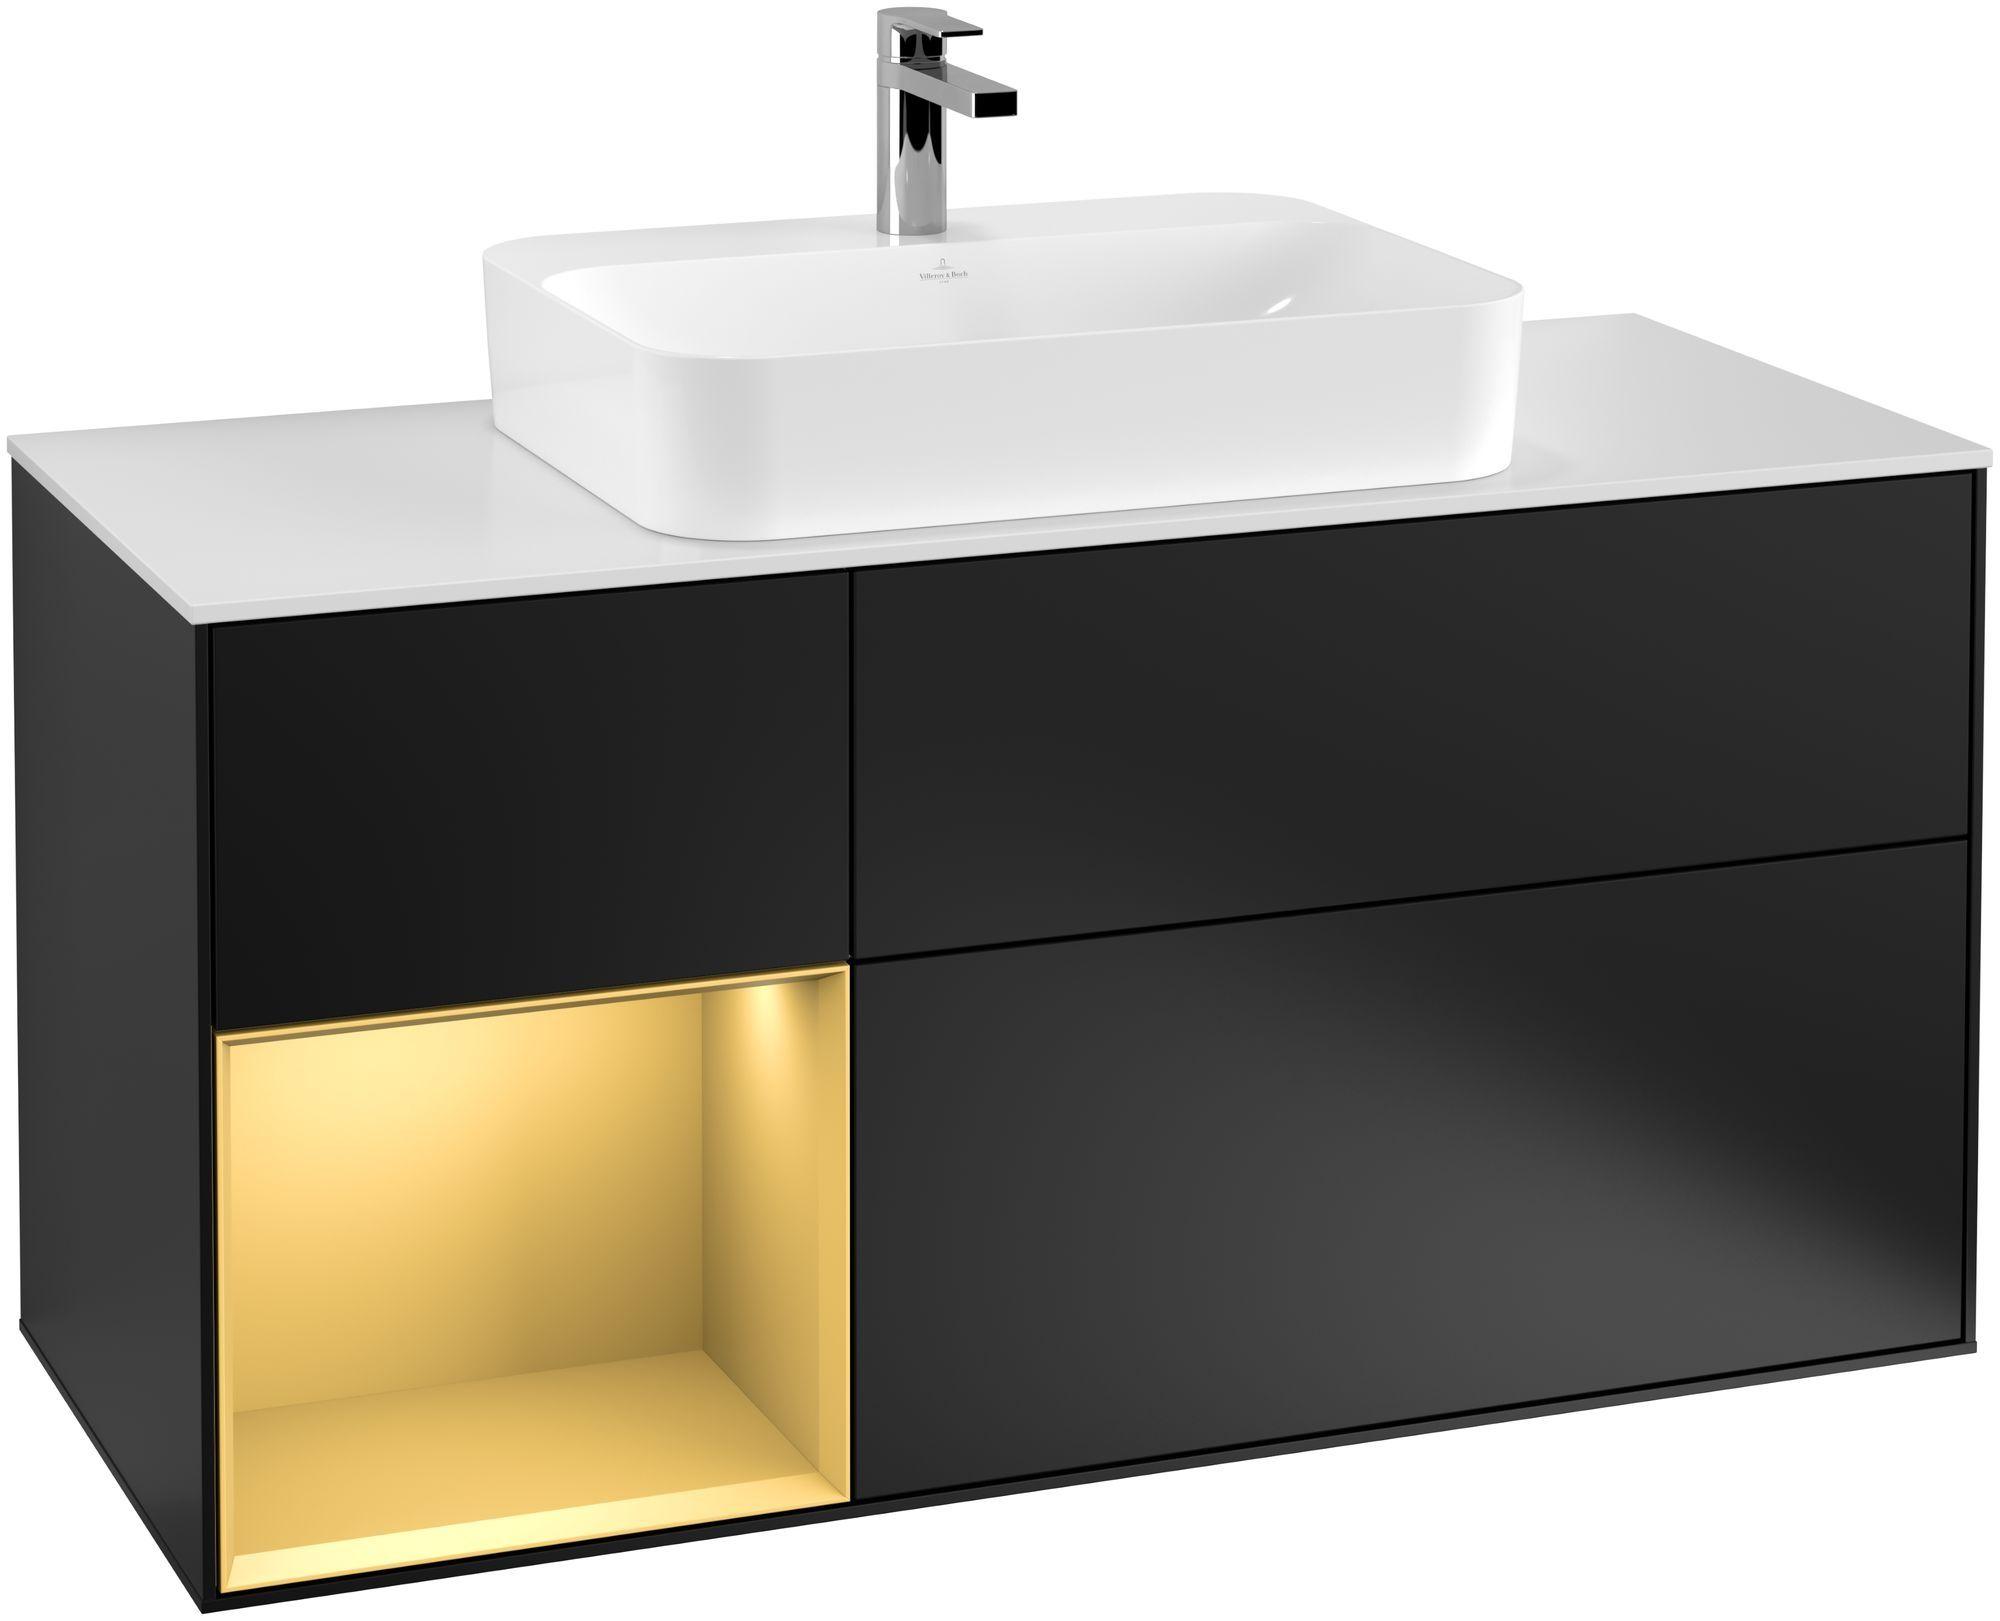 Villeroy & Boch Finion F41 Waschtischunterschrank mit Regalelement 3 Auszüge Waschtisch mittig LED-Beleuchtung B:120xH:60,3xT:50,1cm Front, Korpus: Black Matt Lacquer, Regal: Gold Matt, Glasplatte: White Matt F411HFPD